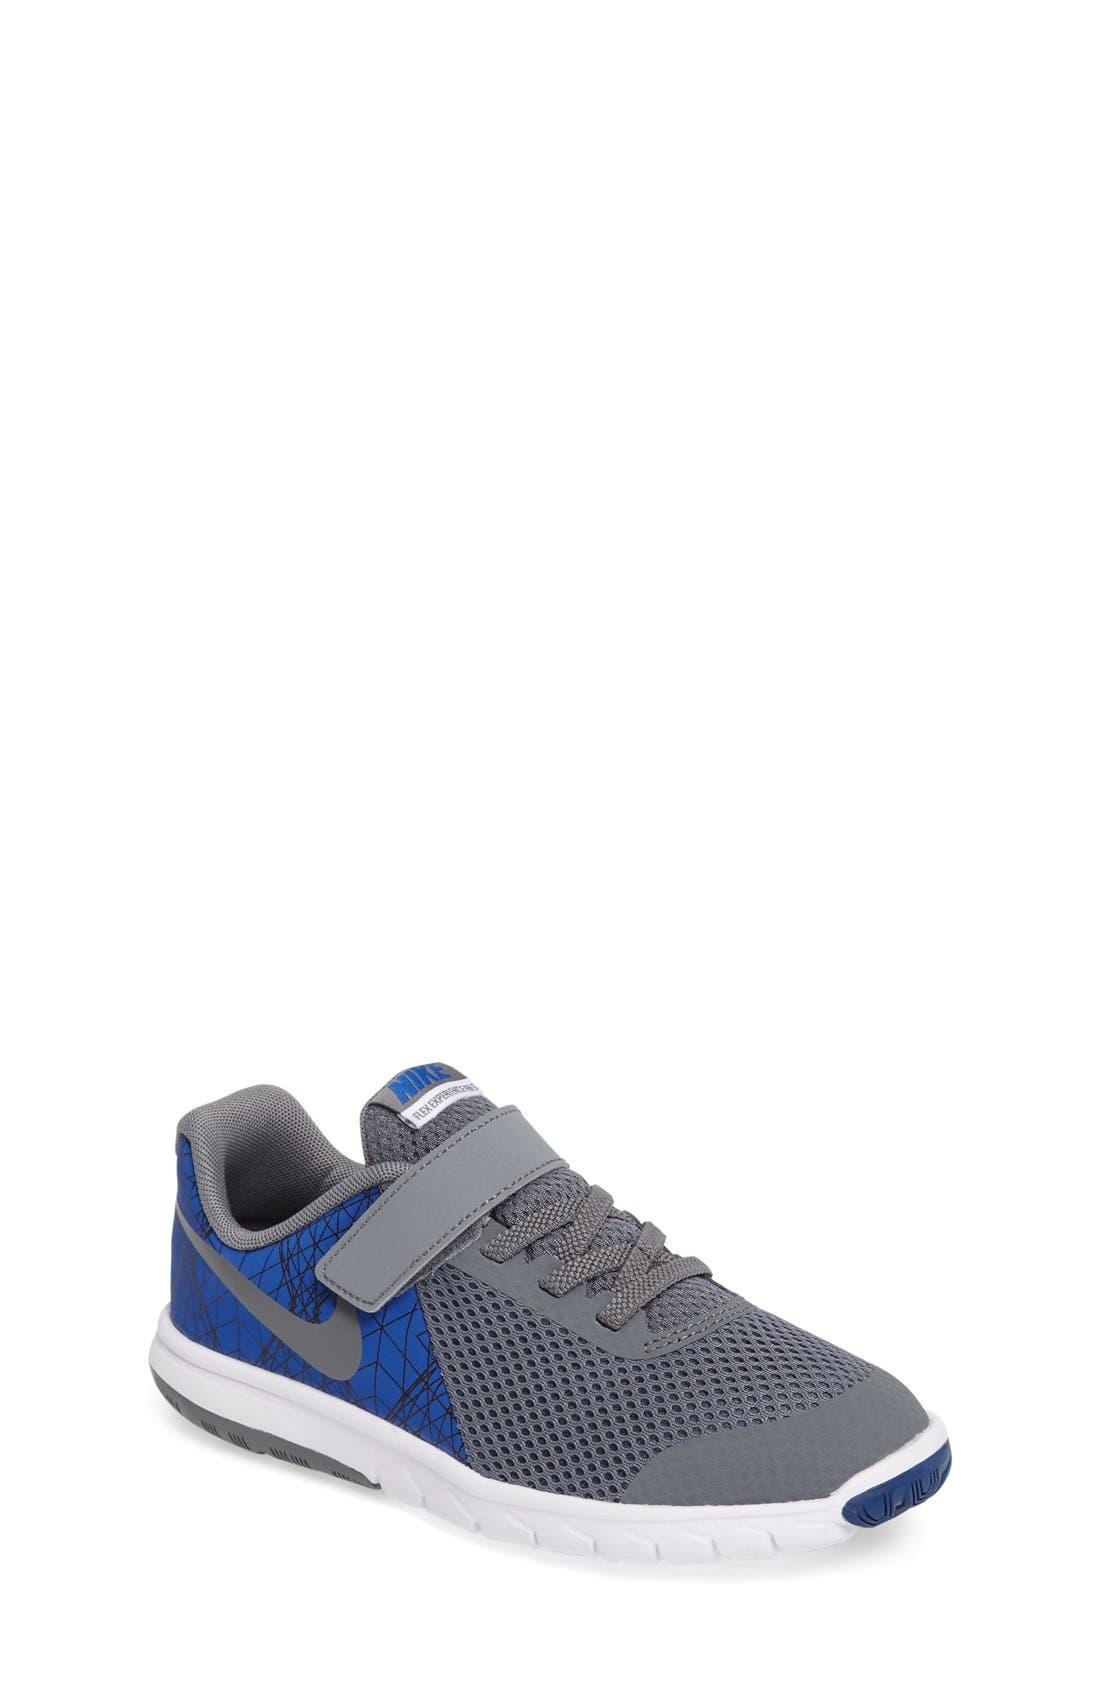 Main Image - Nike 'Flex Experience 5 Print' Running Shoe (Toddler & Little Kid)